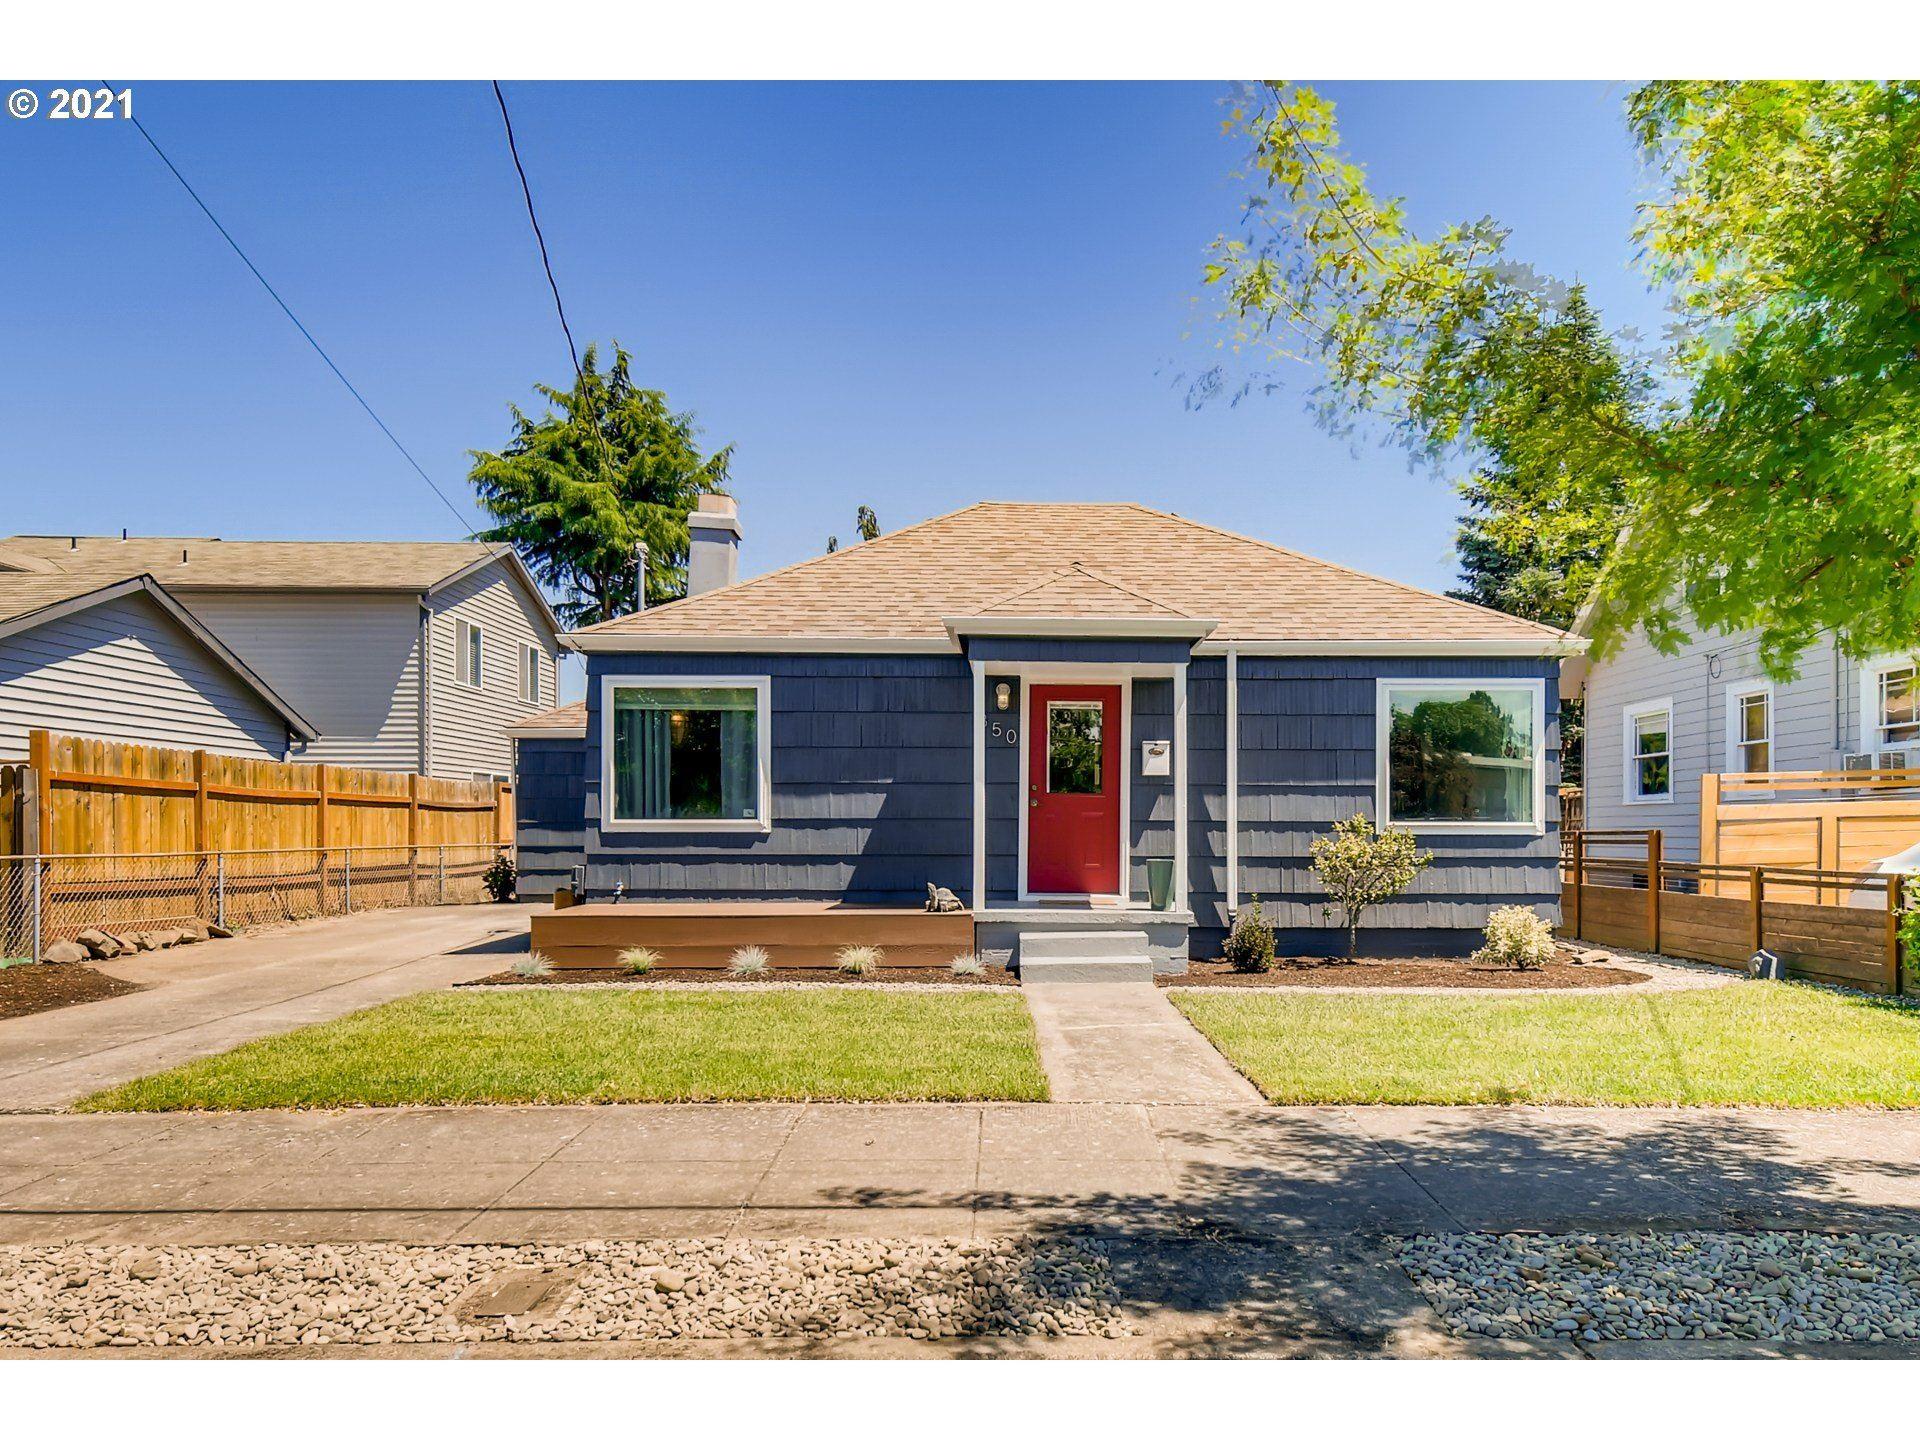 850 NE 74TH AVE, Portland, OR 97213 - MLS#: 21285354